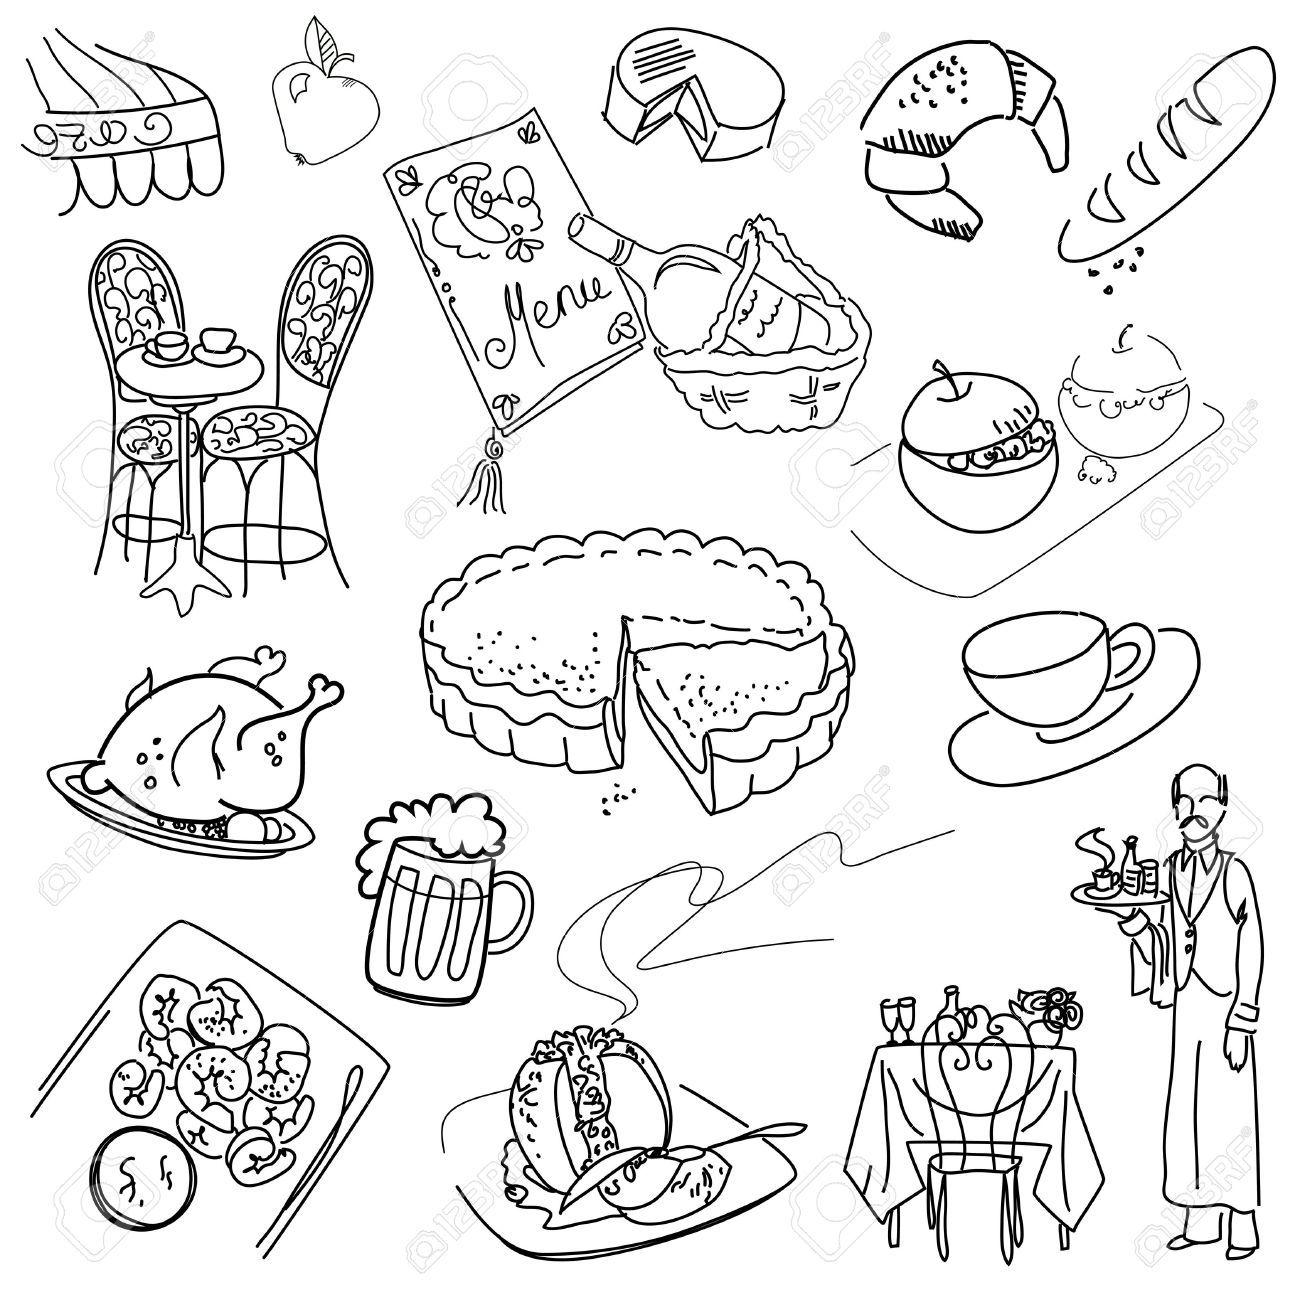 Food Doodles Elegant Cuisine Doodles Food Doodles Doodle Drawings